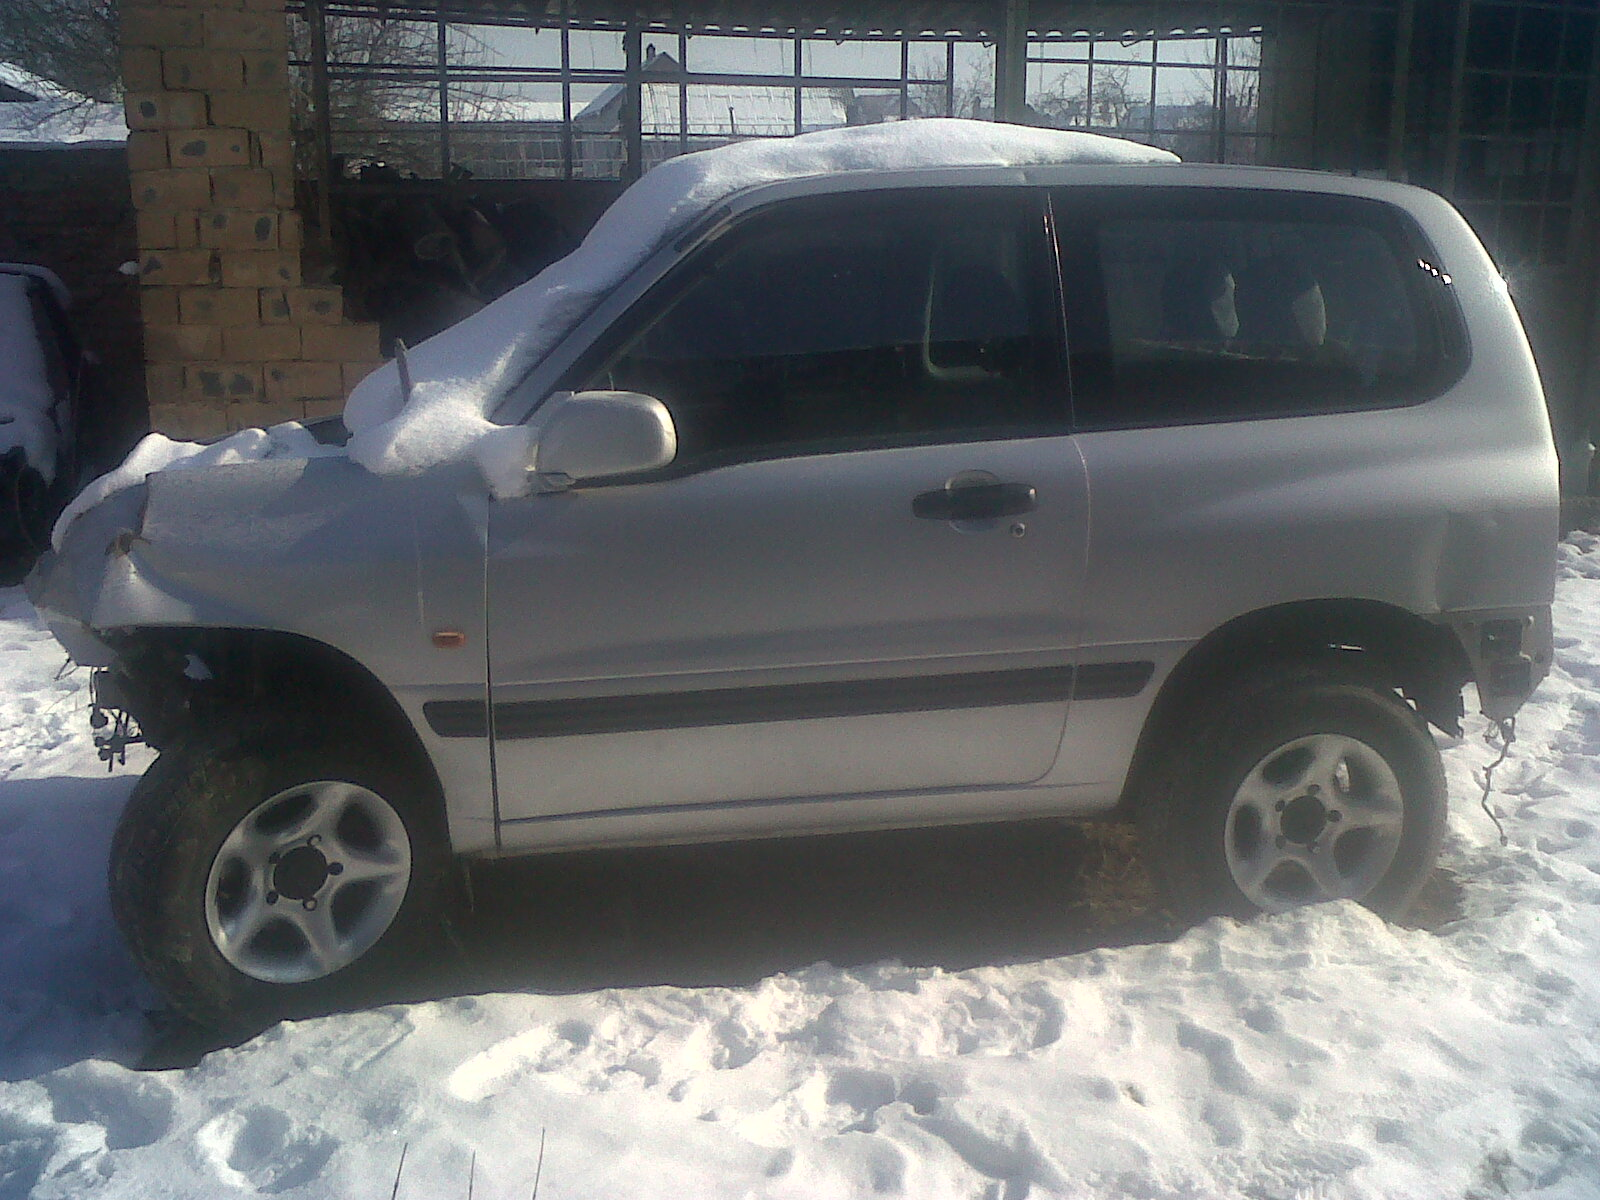 Dezmembrez Suzuki Vitara 2011 Benzina SUV - 31 Ianuarie 2011 - Poza 1